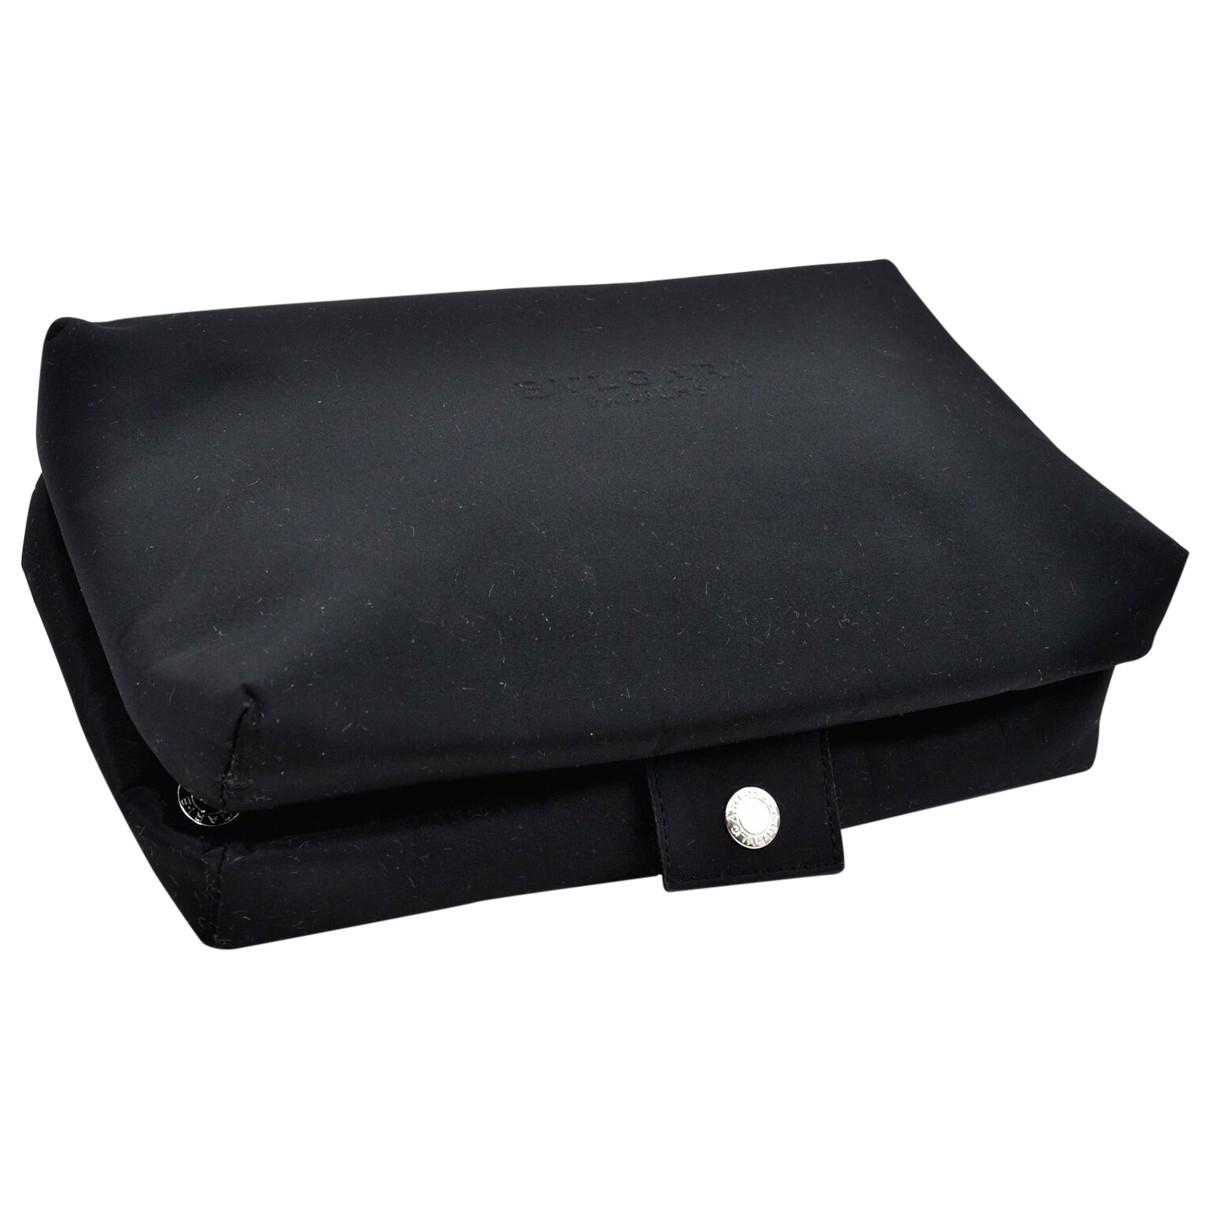 Bvlgari \N Black Clutch bag for Women \N